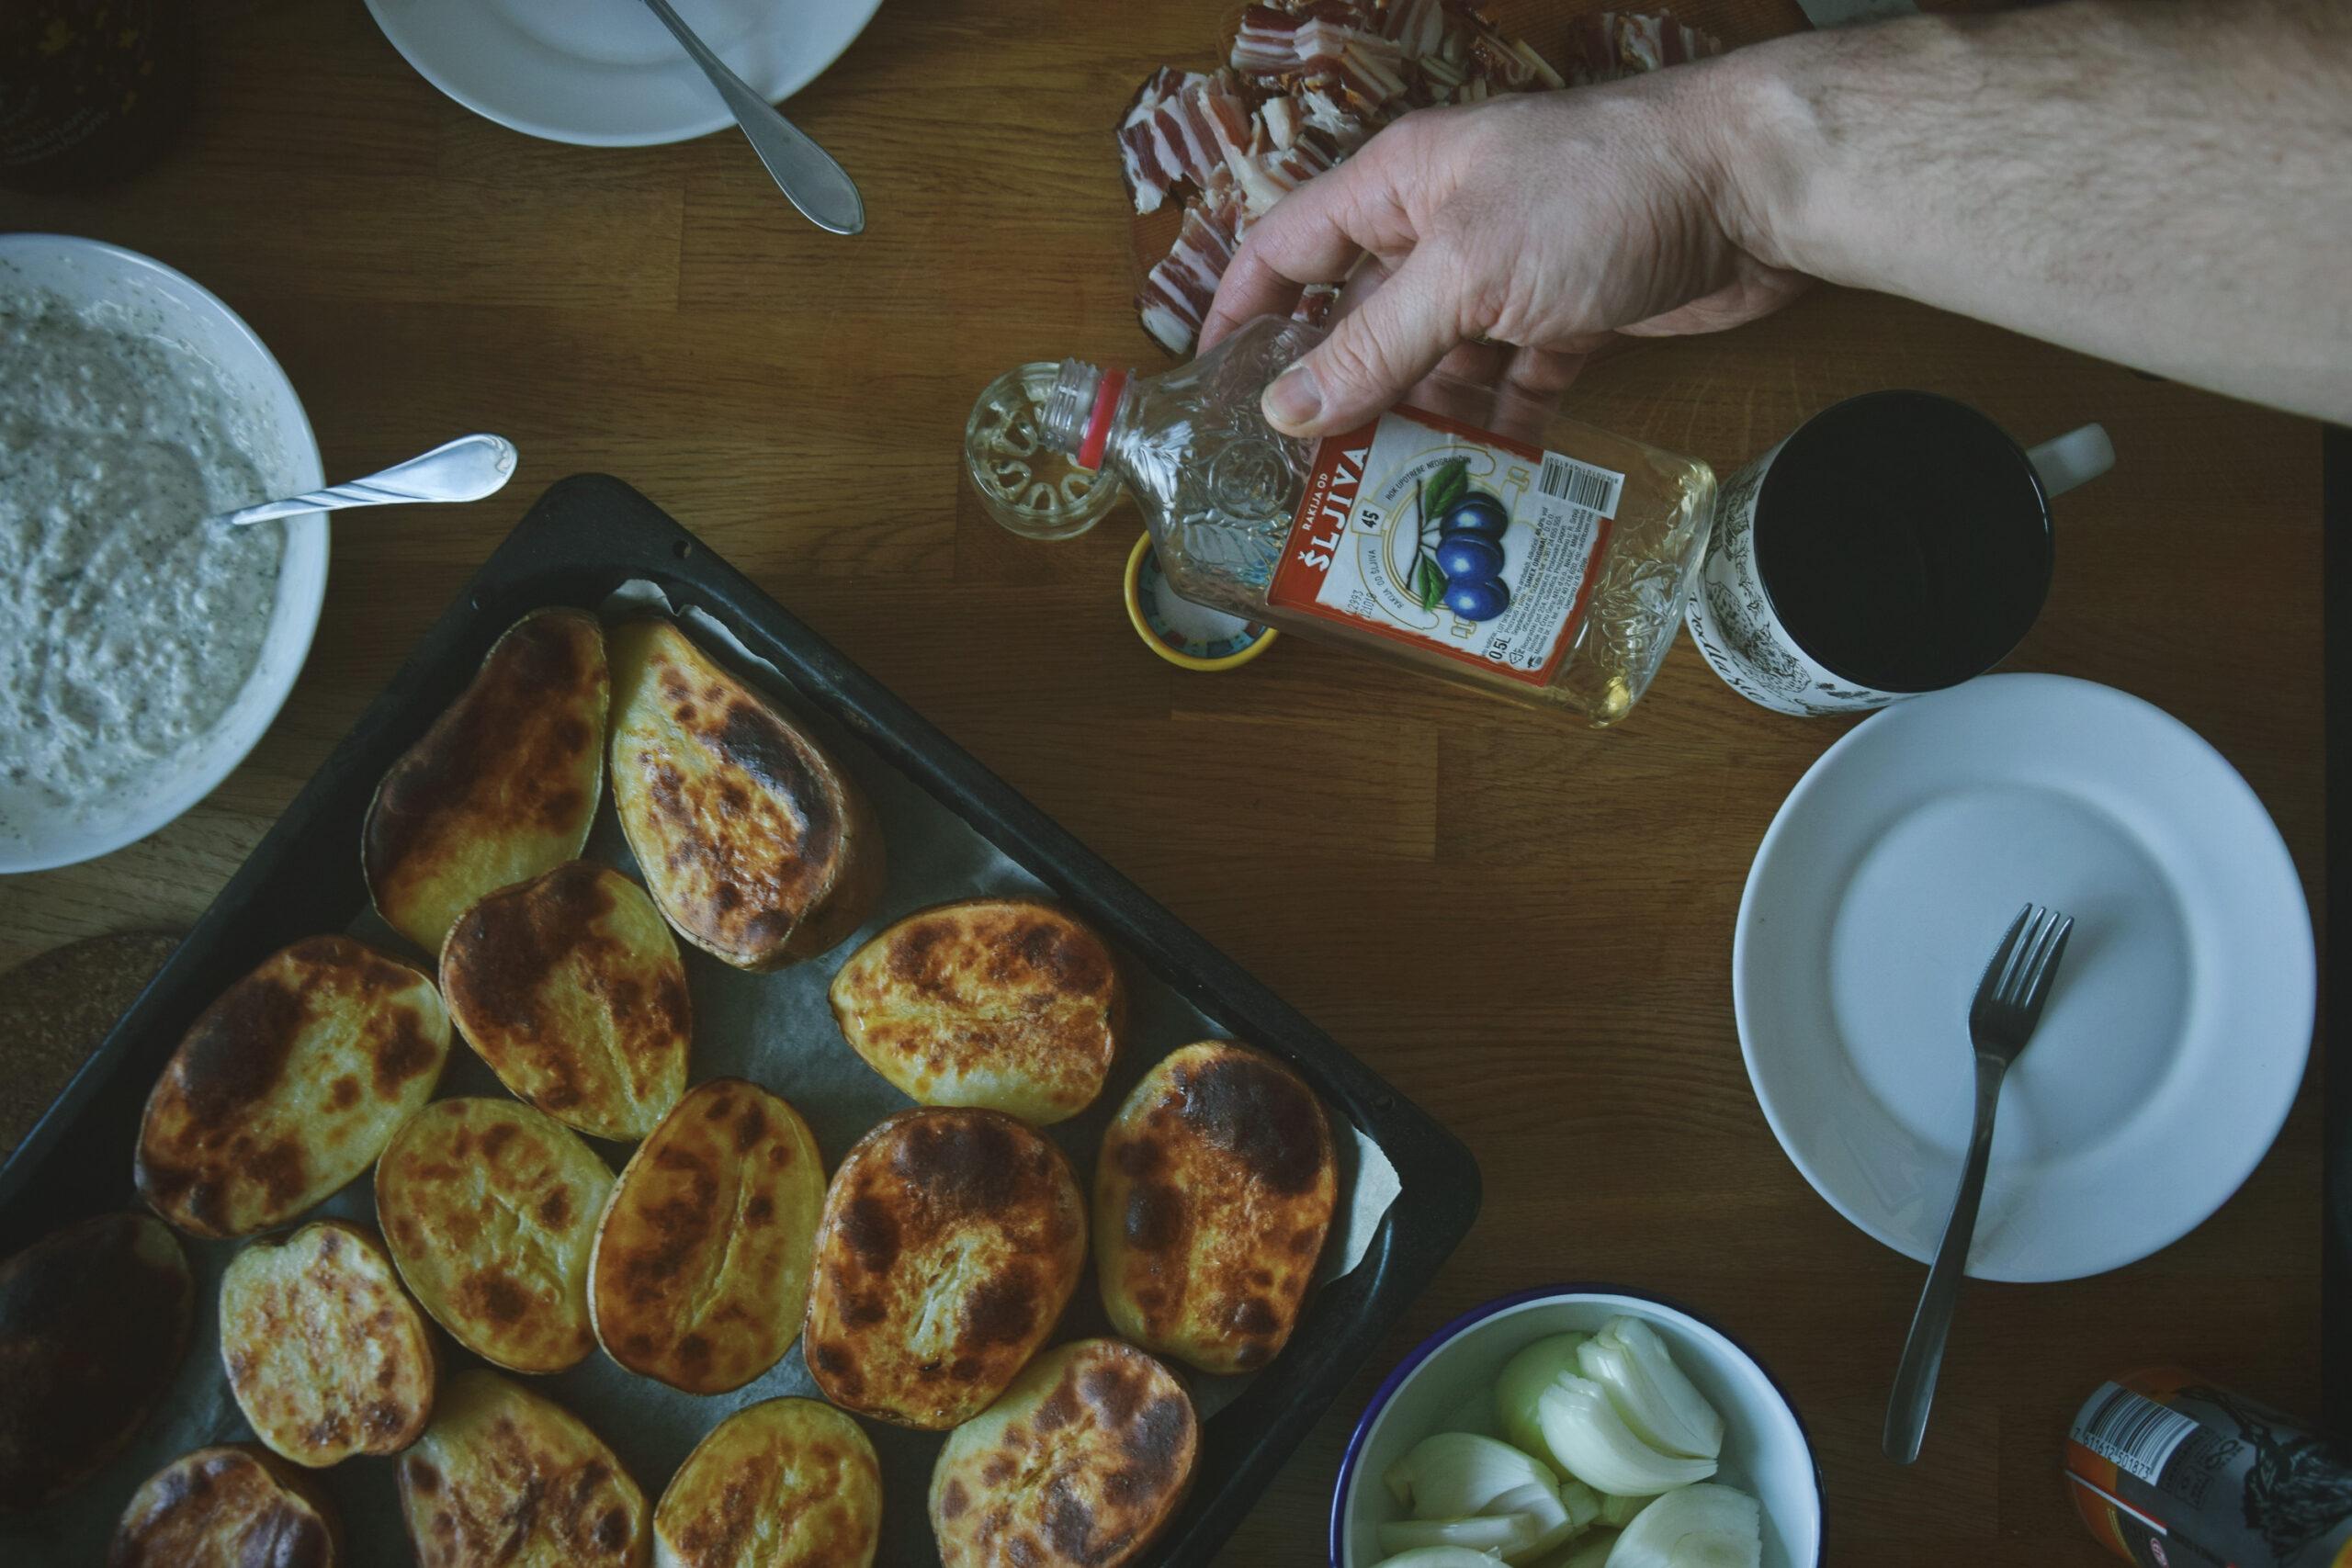 Pomysły na proste serbskie śniadanie